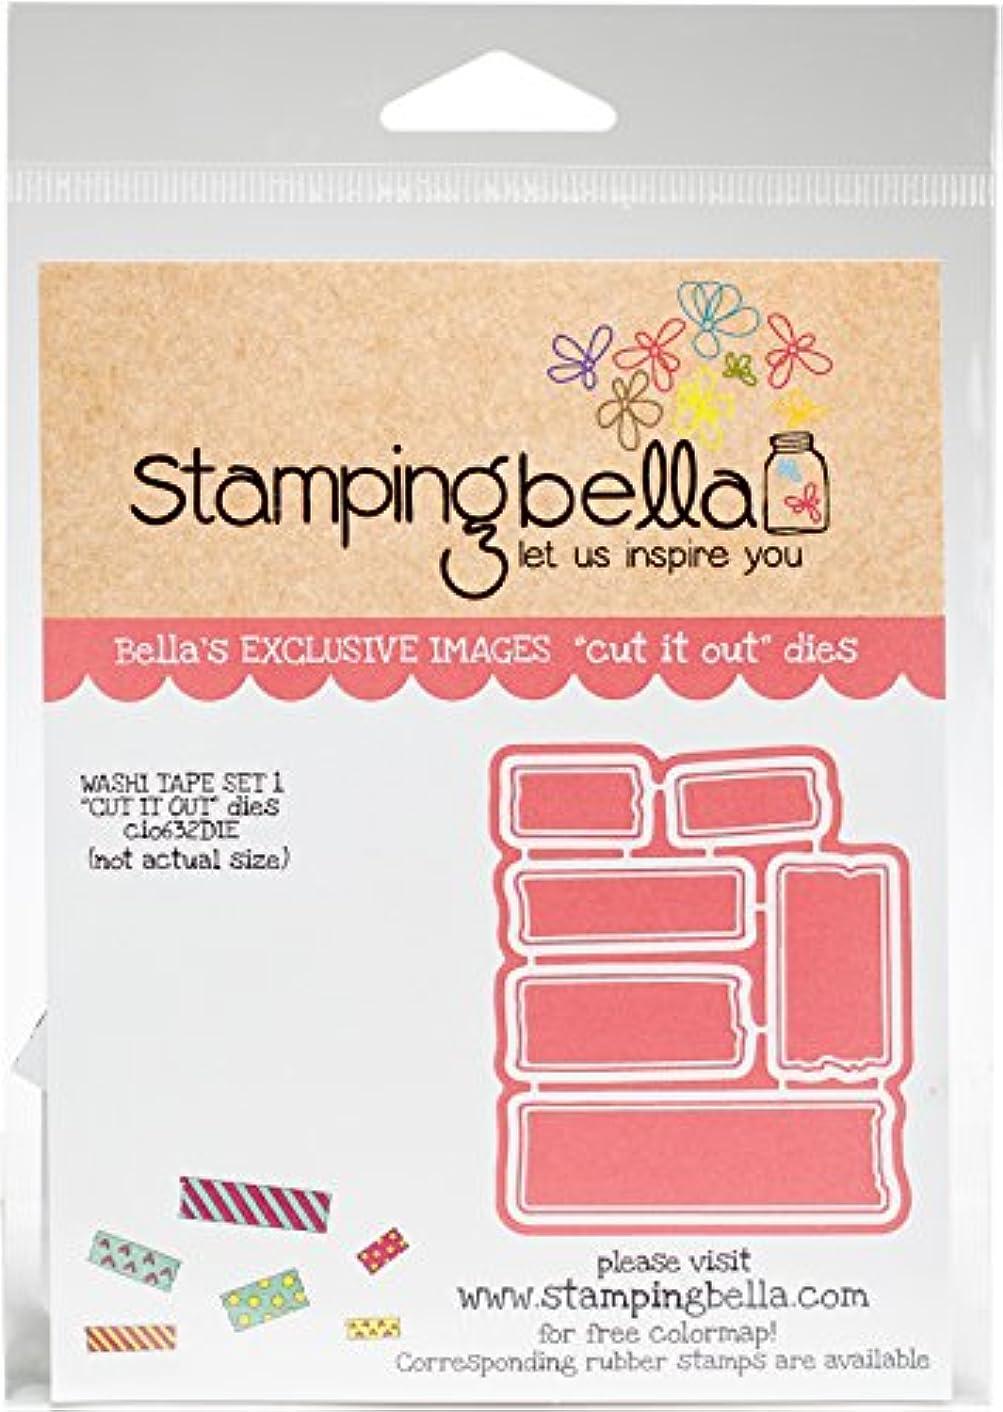 Stamping Bella Washi Tape Set 1 Cut It Out Dies